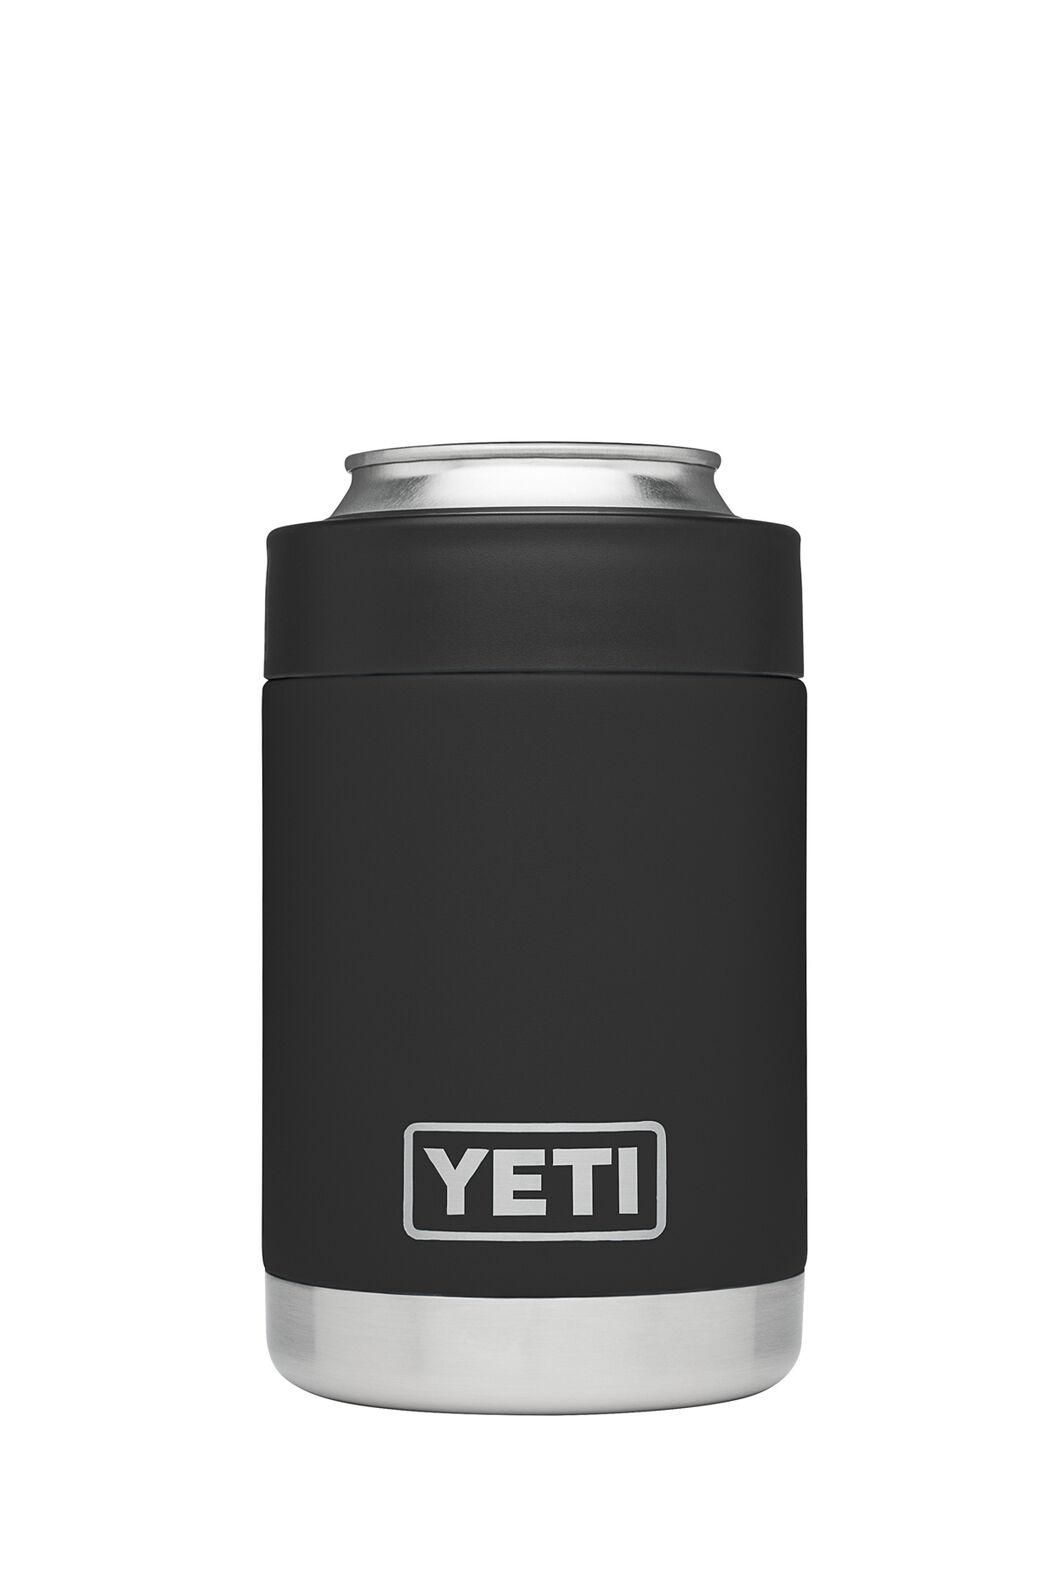 Yeti Rambler Colster Drink Holder, Black, hi-res